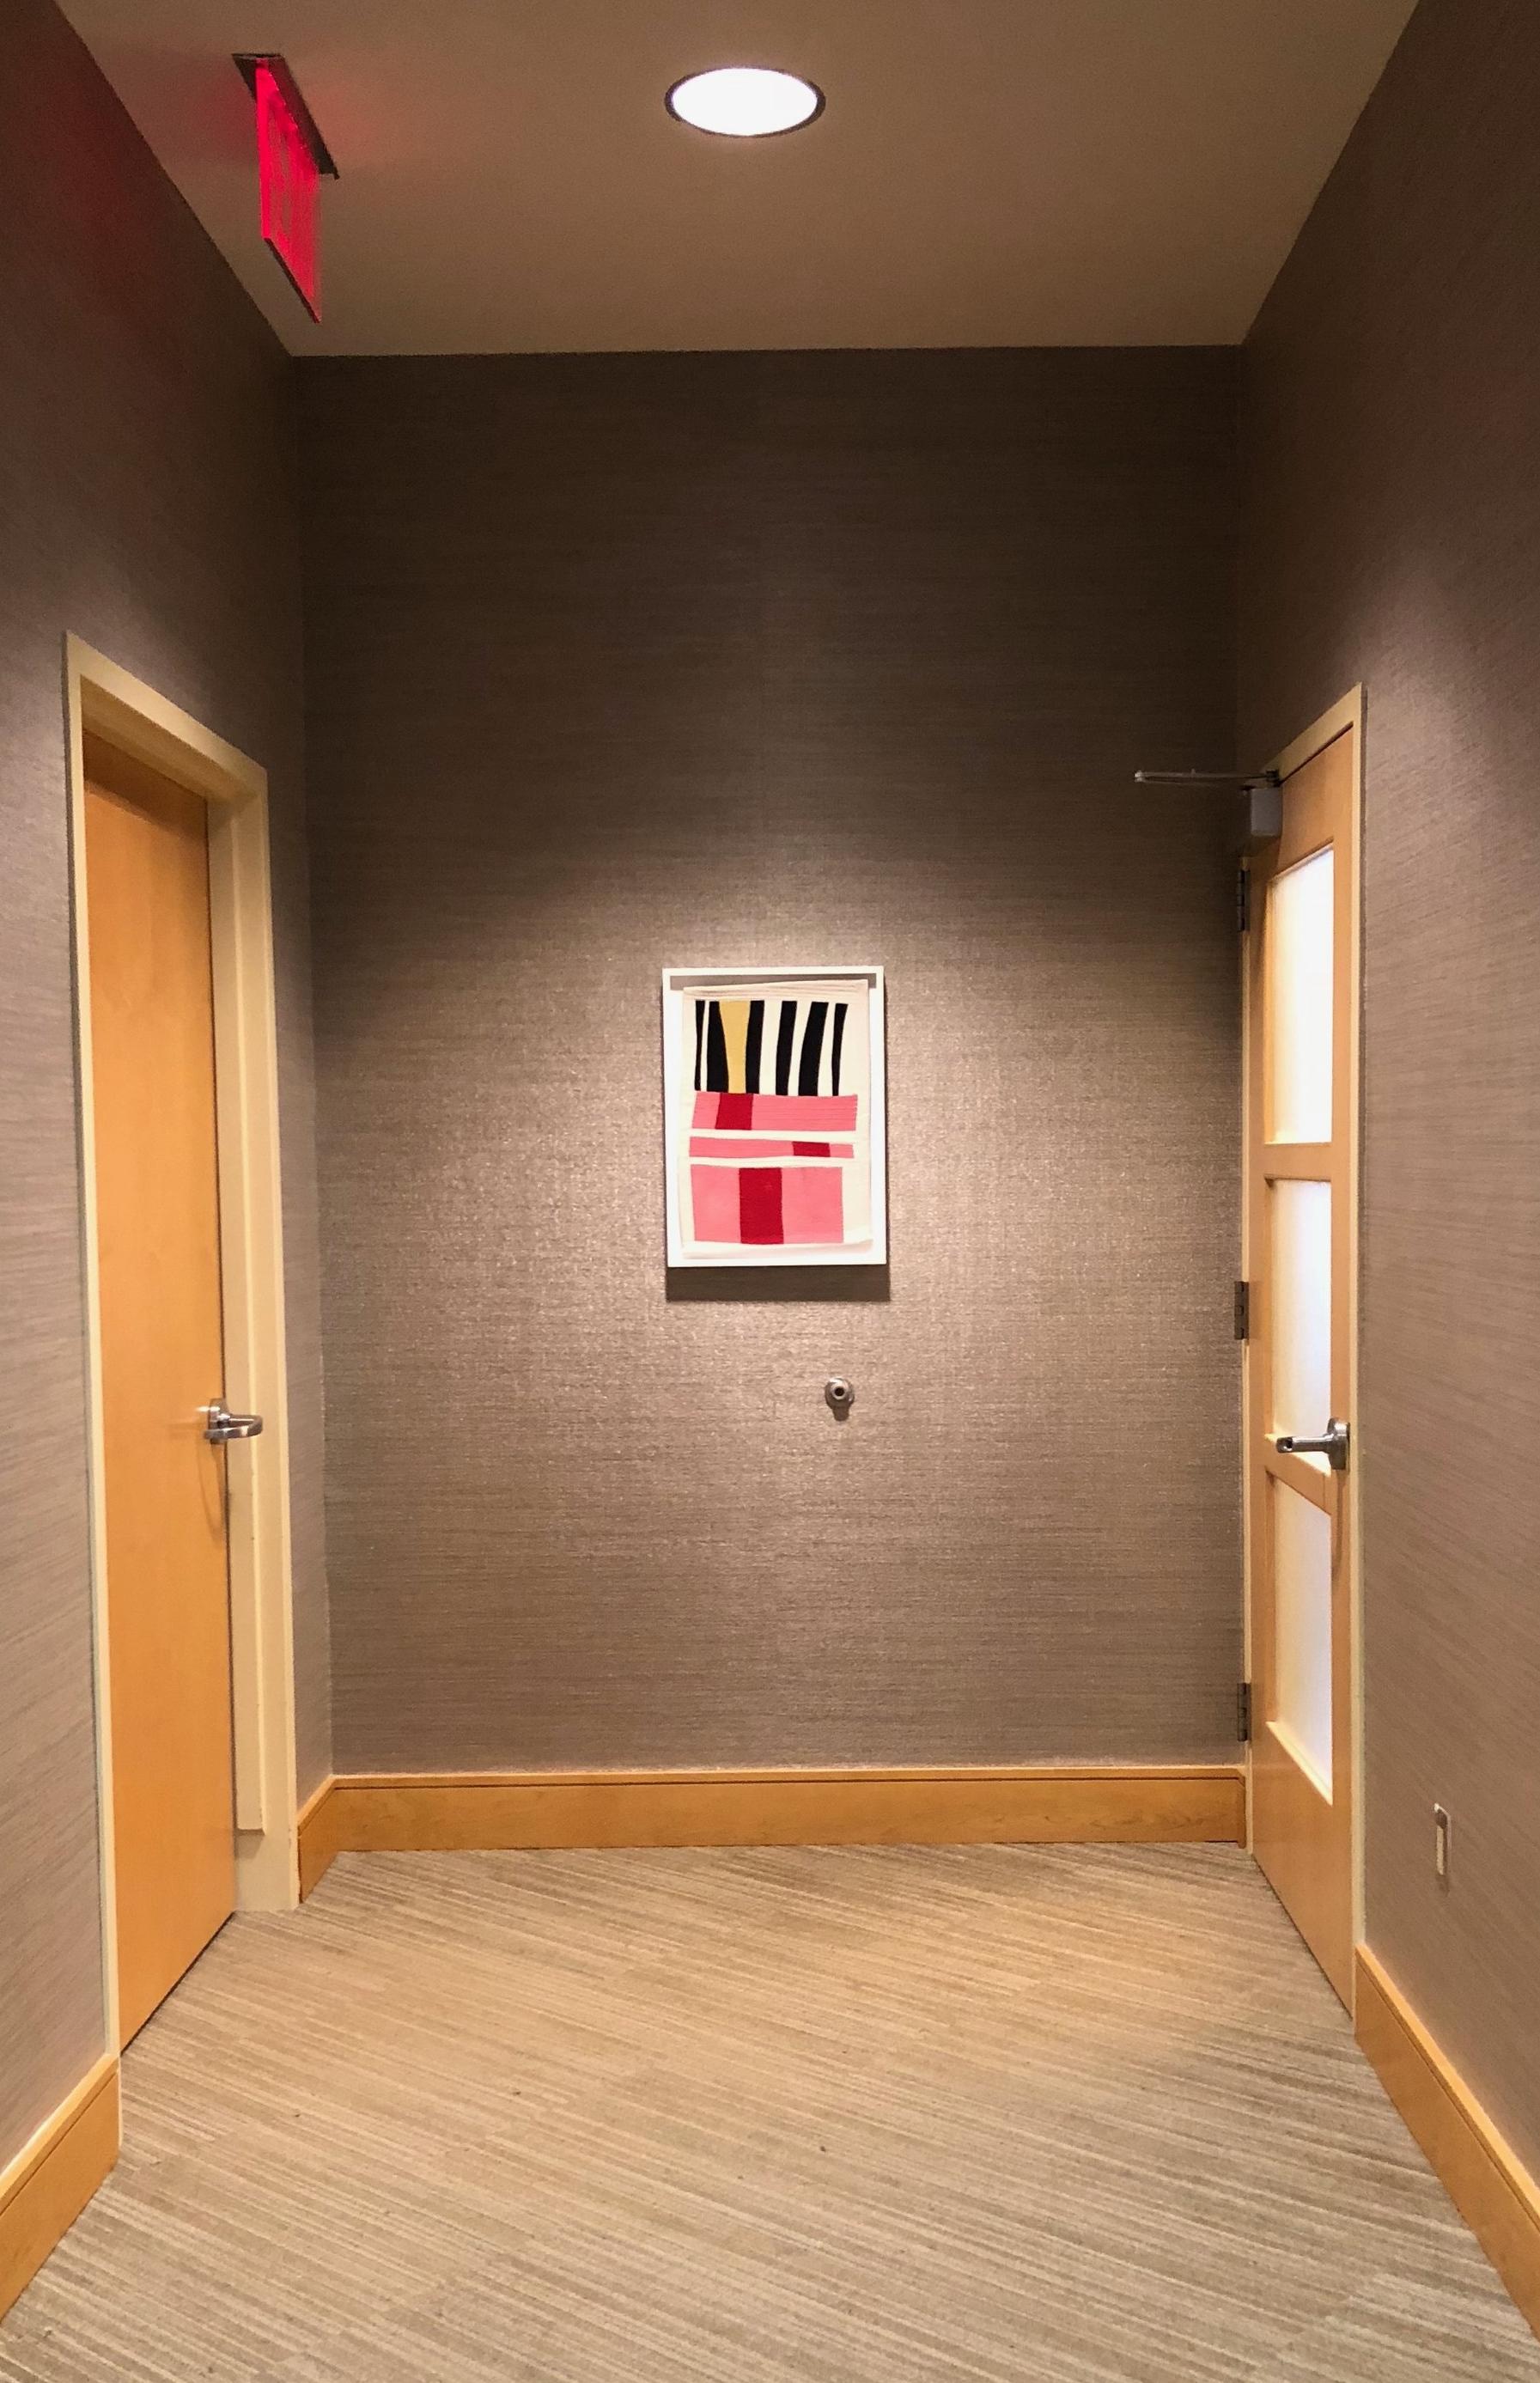 Installation View:Valerie Zeman, Form/Color #2, 2017